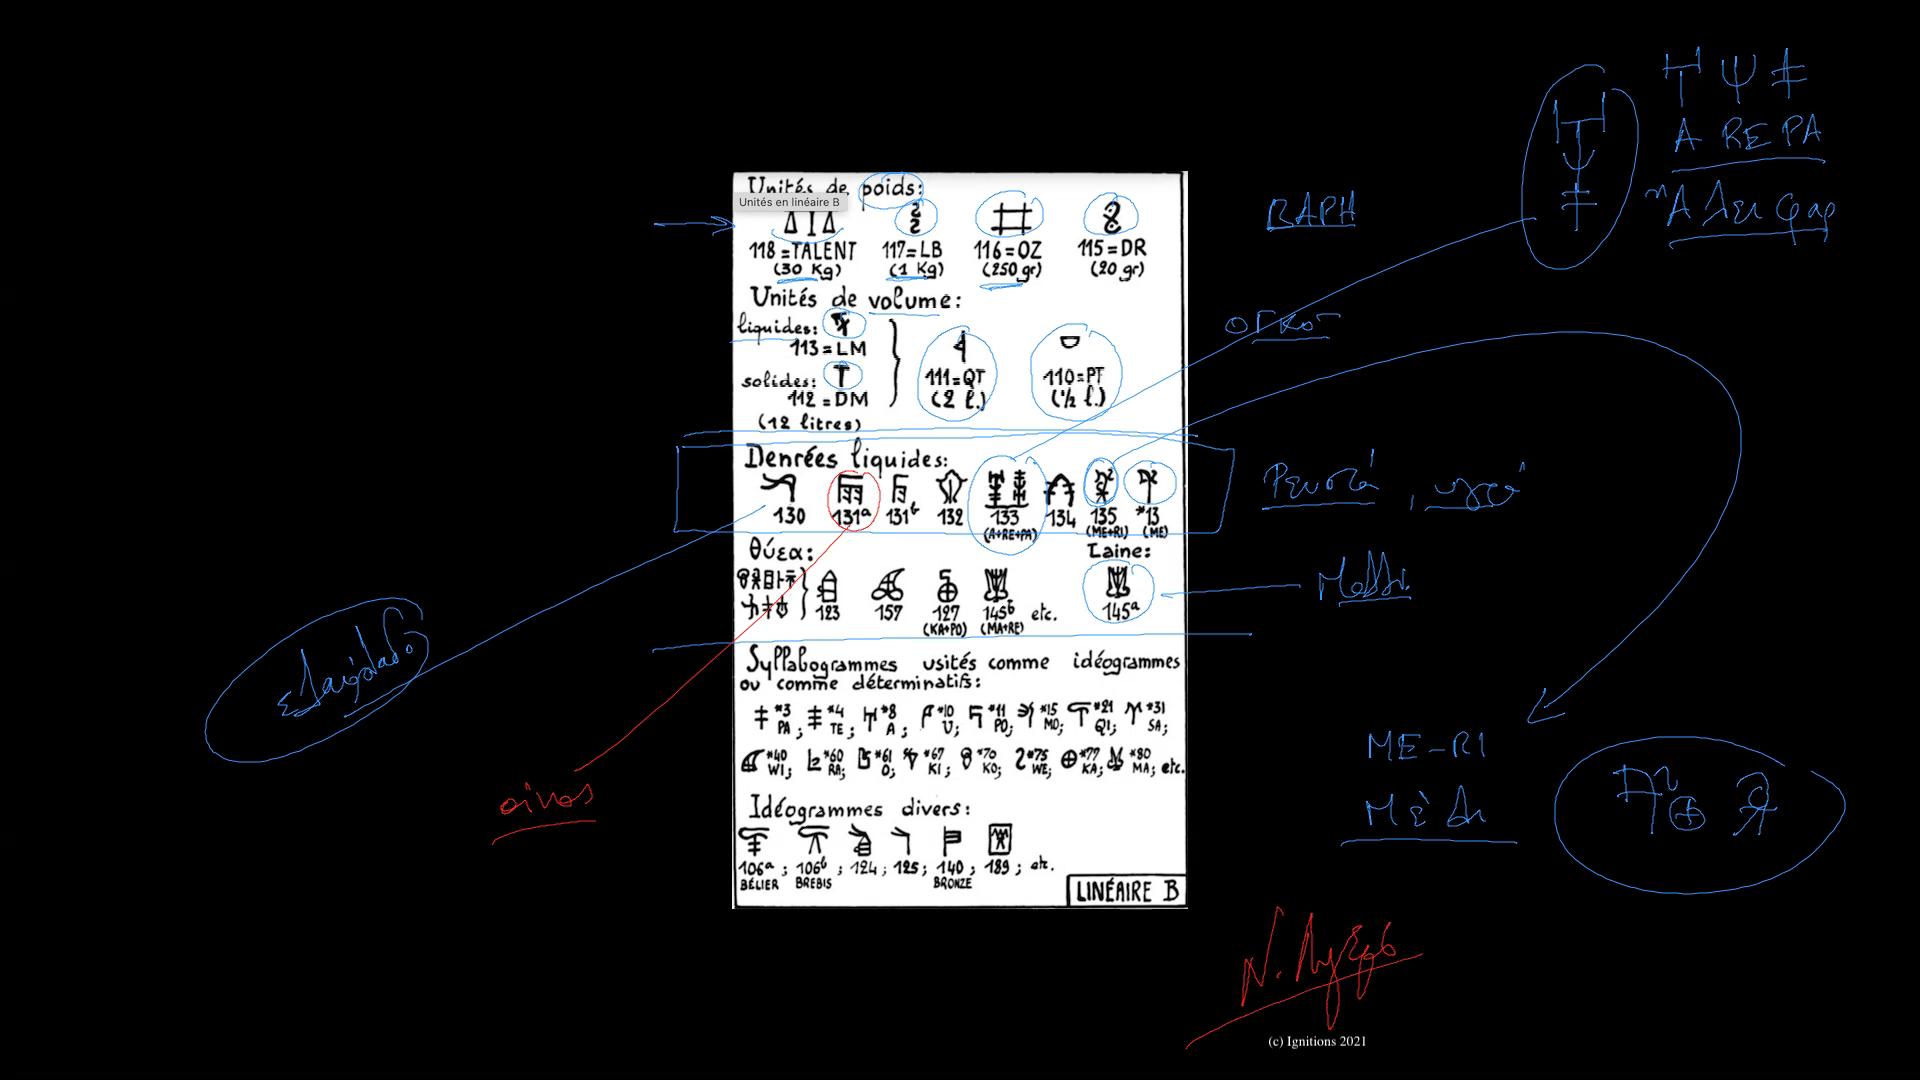 59578 - e-Μάθημα VI: Αρχαία συστήματα αρίθμησης. (Dessin)